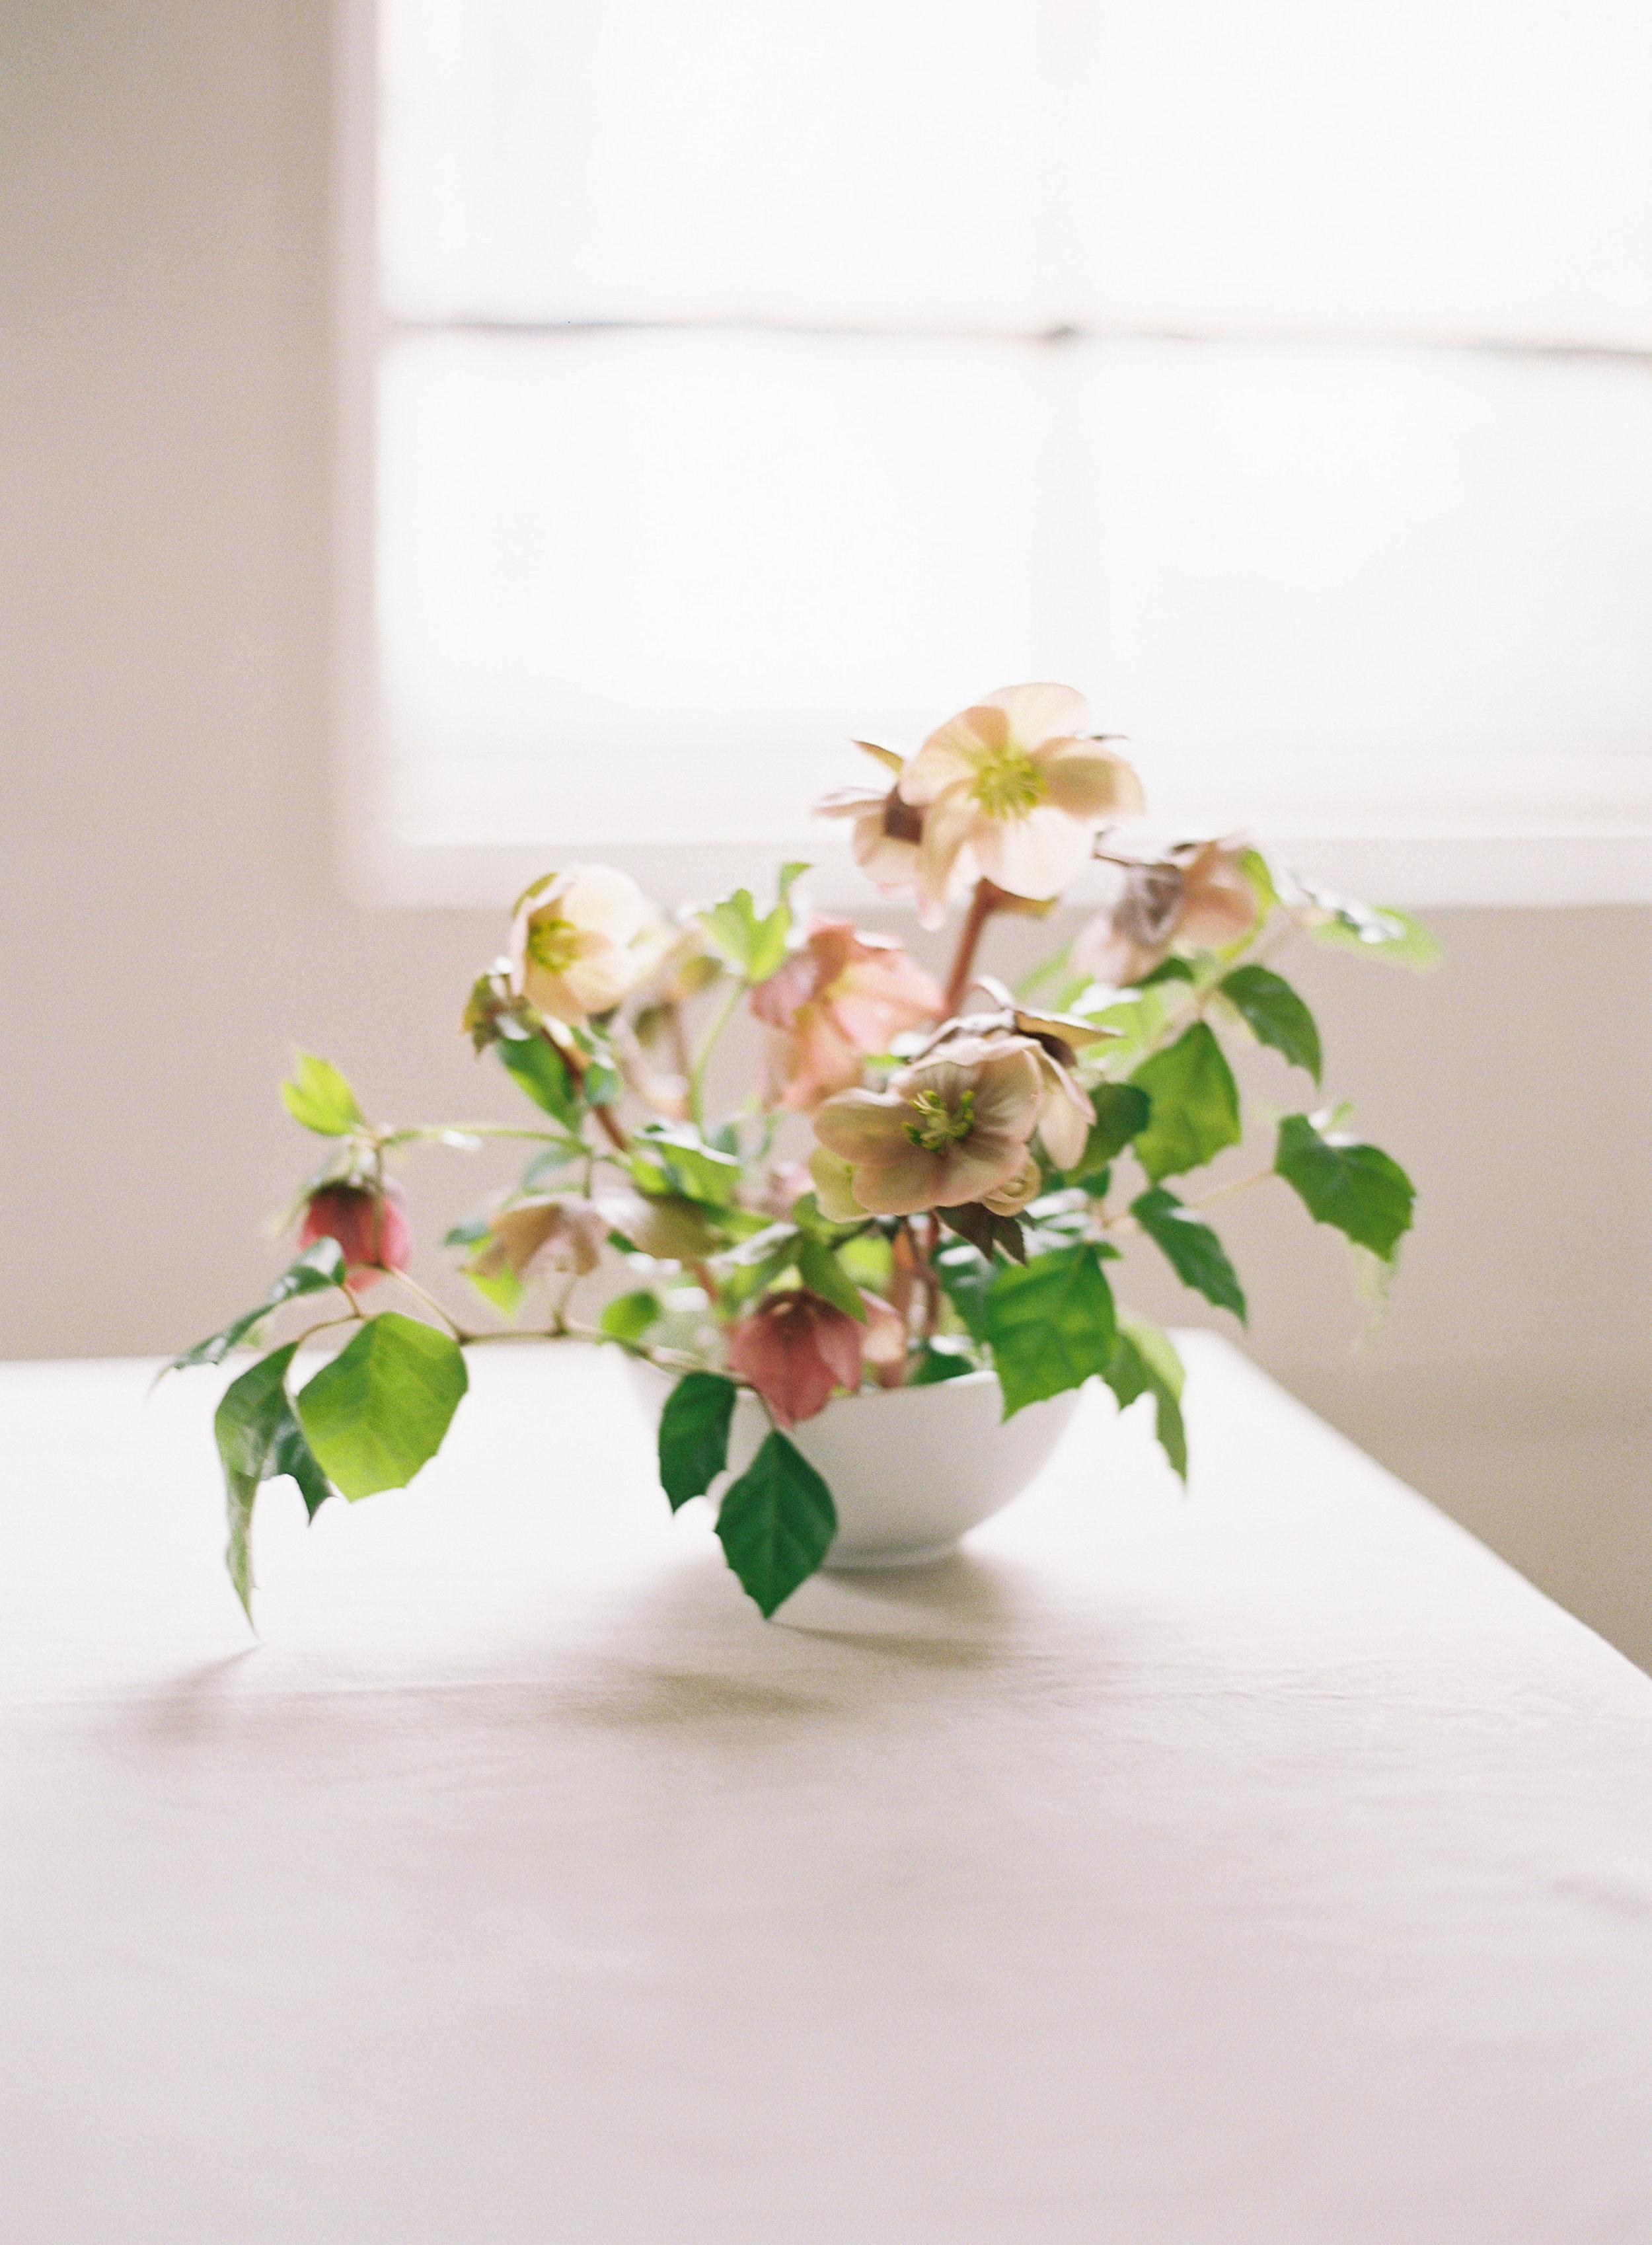 All Floral Images-0089.jpg